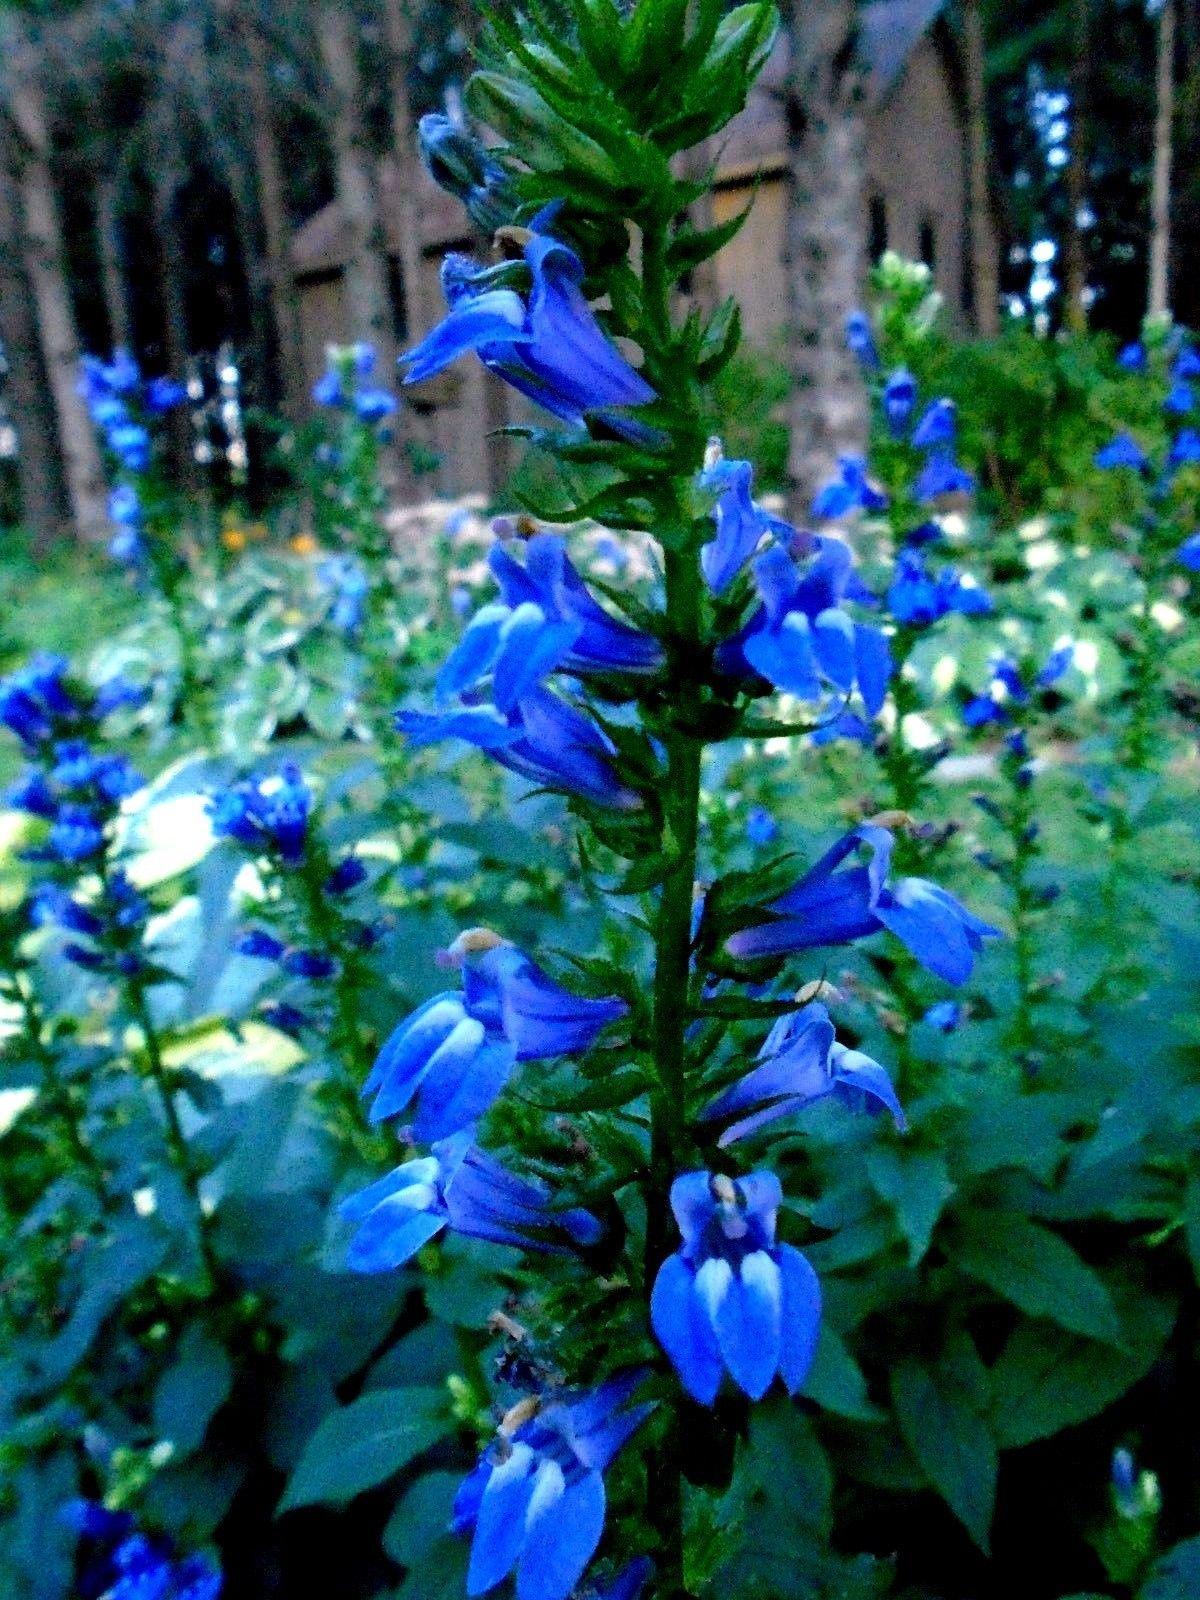 Blue Lobelia Plant Flowering Perennial Favorites Flowers